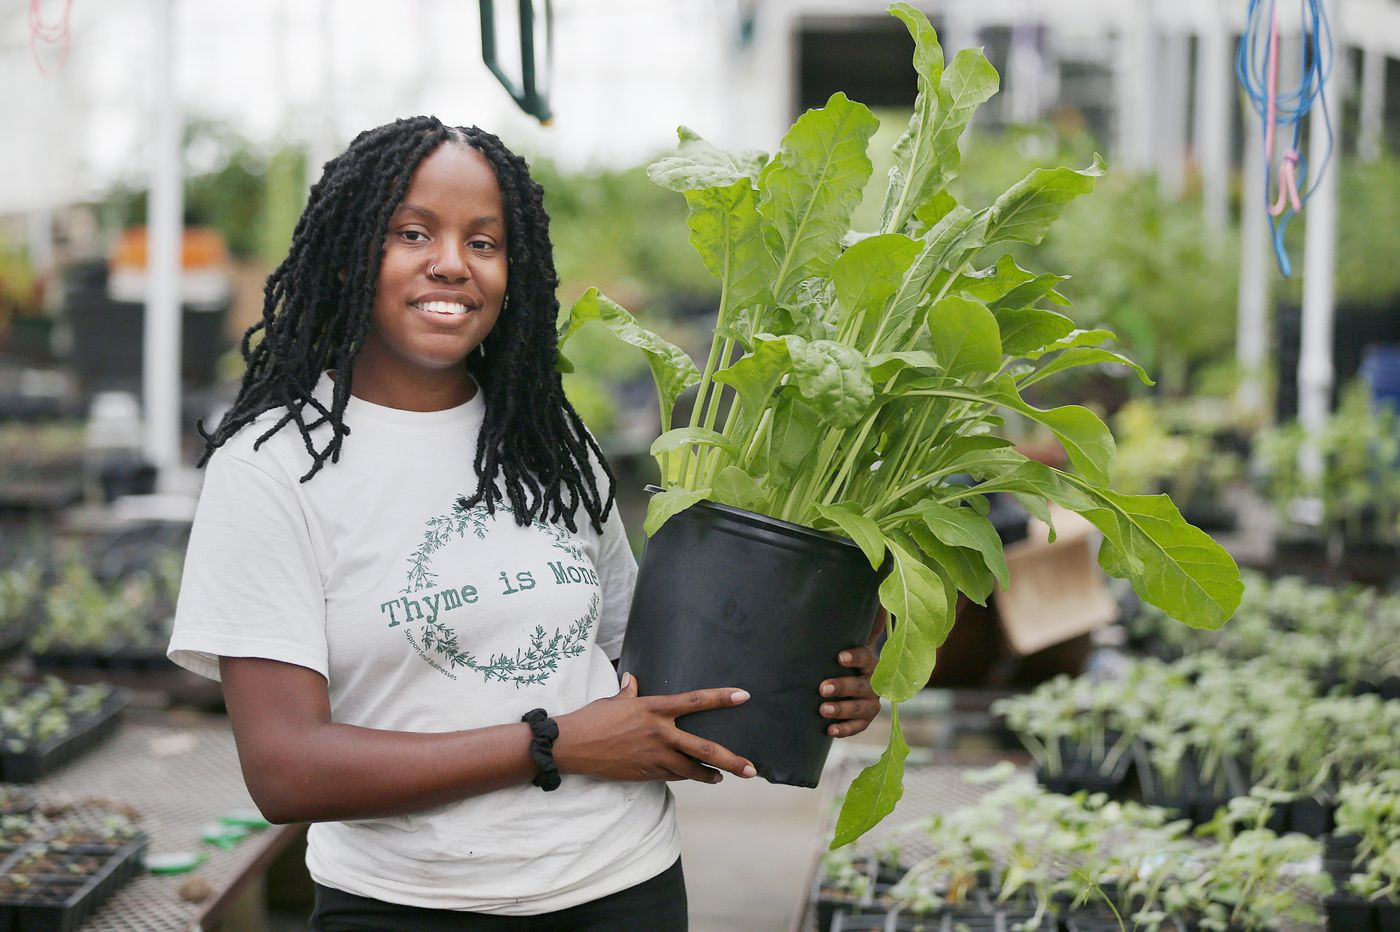 Inspired by Caribbean Farmers, Local Woman Creates FarmerJawn CSA in Elkins Park